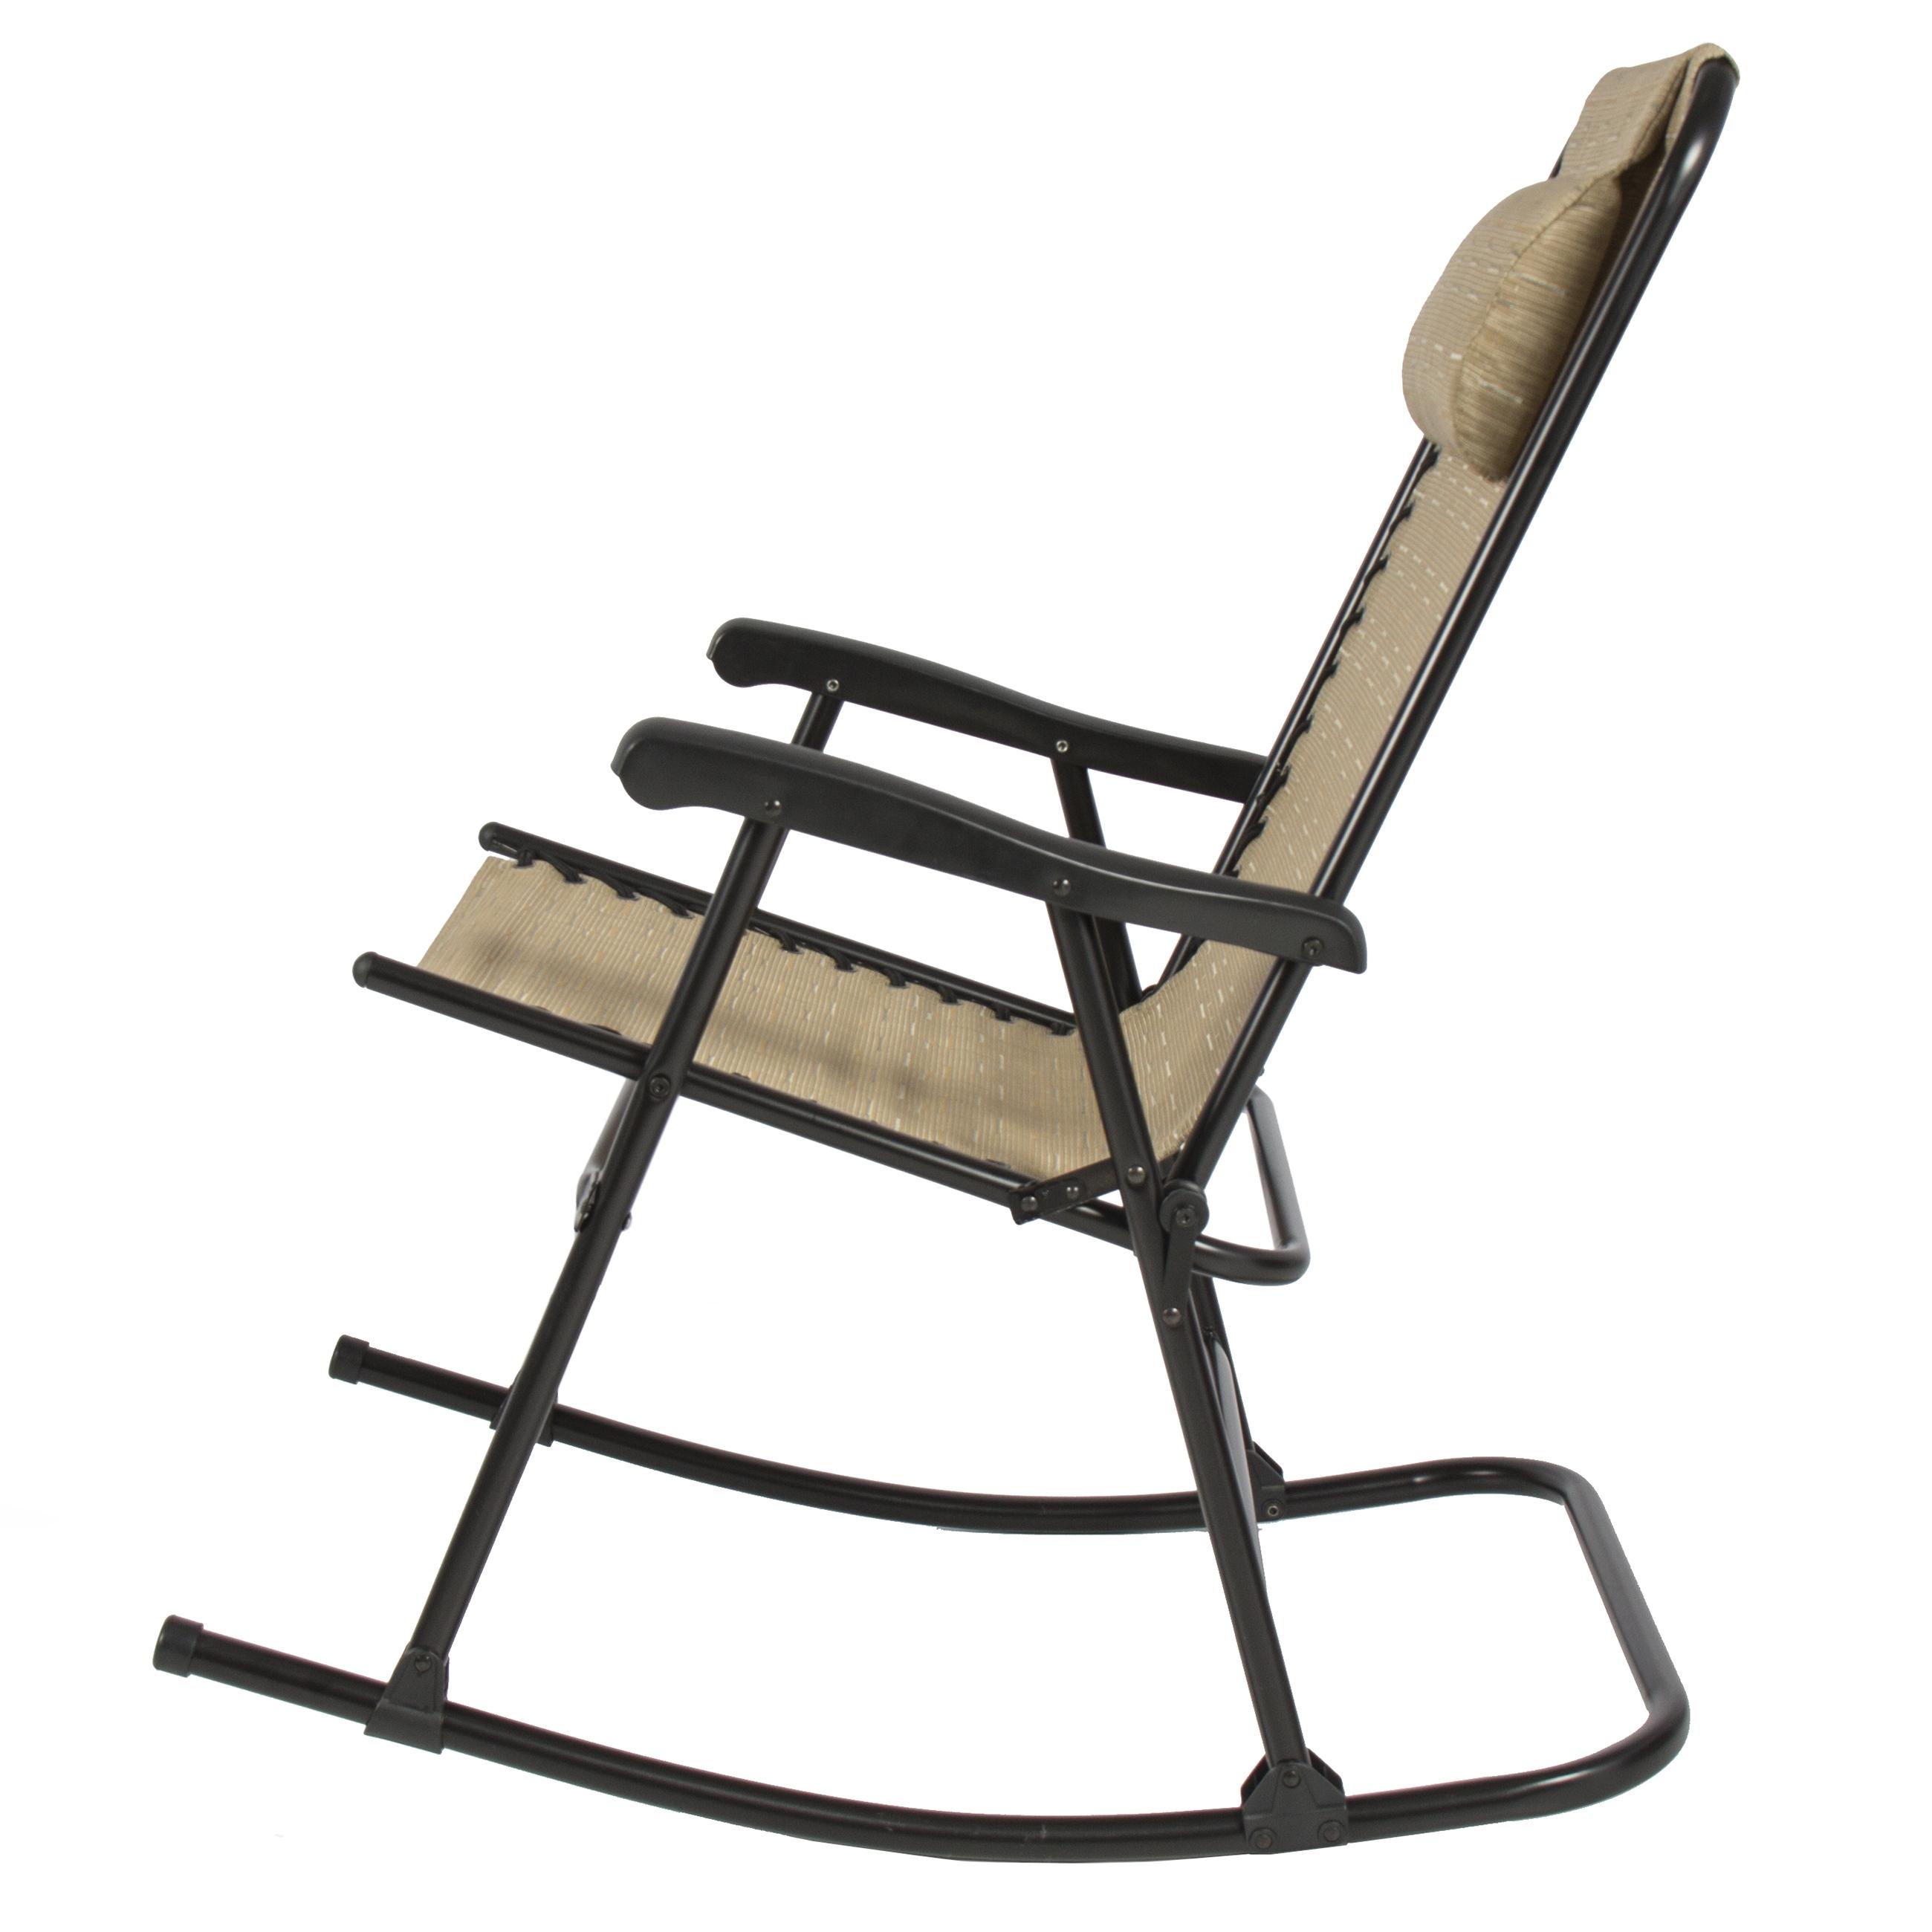 2017 Manhattan Patio Grey Rocking Chairs Inside Manhattan Patio Rocking Chair Grey Rona (View 15 of 15)